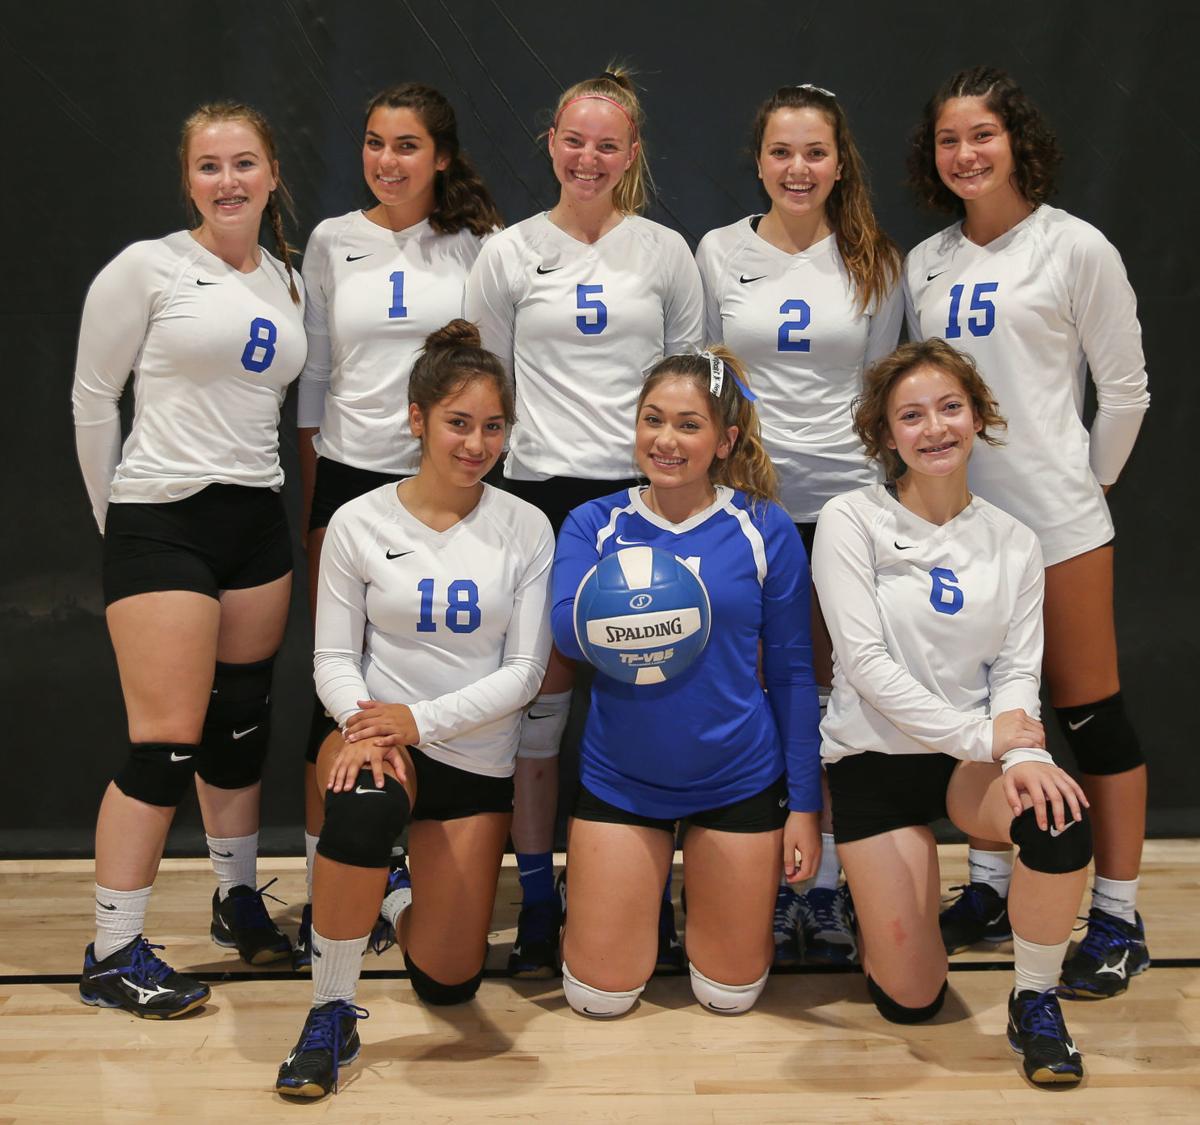 082019 Lompoc Volleyball Team 01.jpg